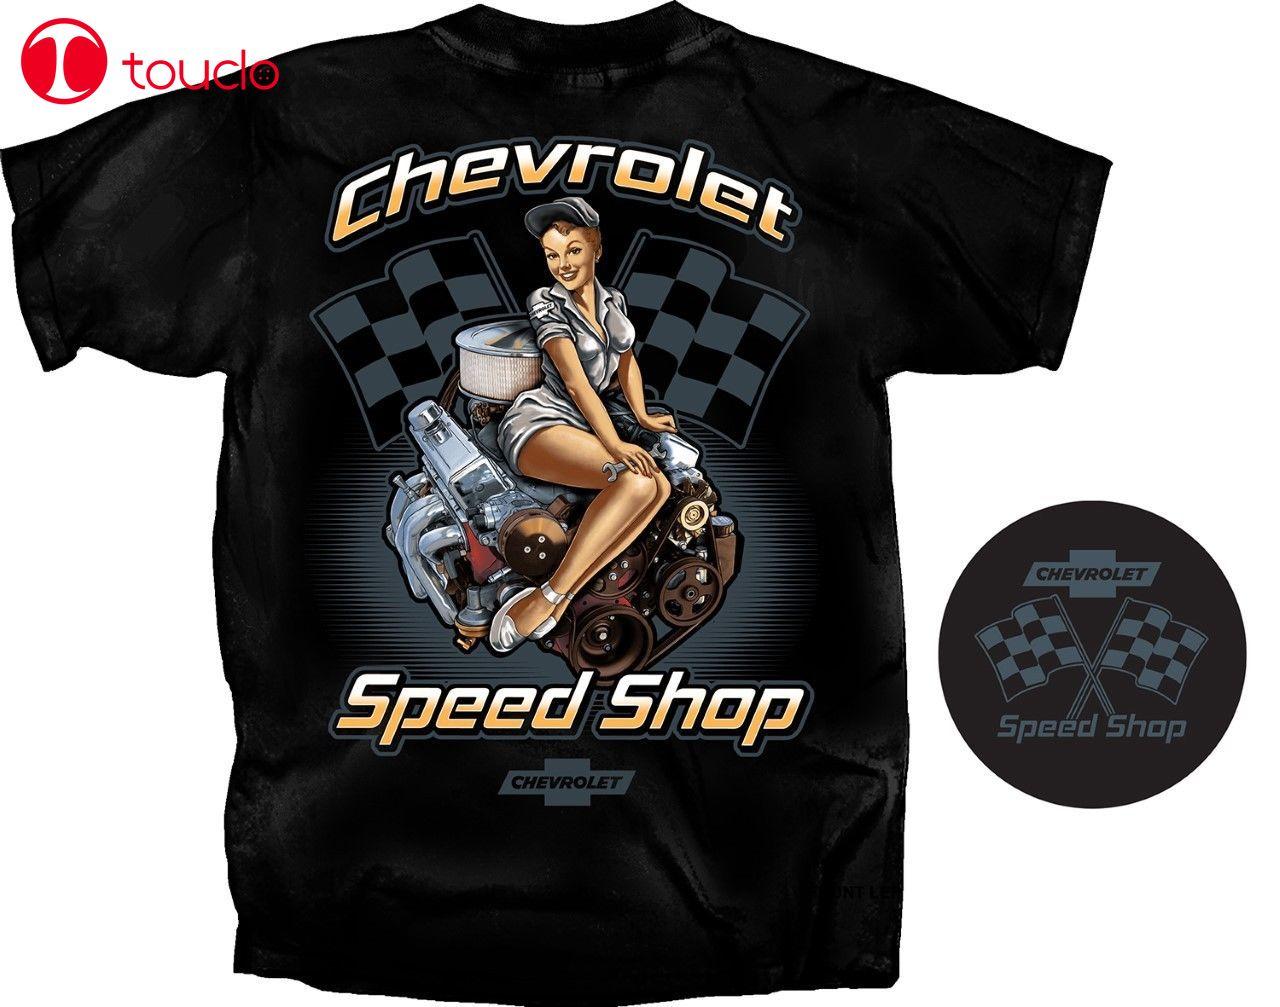 2019 camiseta fresca de verano Chevrolet Speed Shop Pin-Up camiseta negra banderas de carrera pequeño bloque motor camiseta con capucha